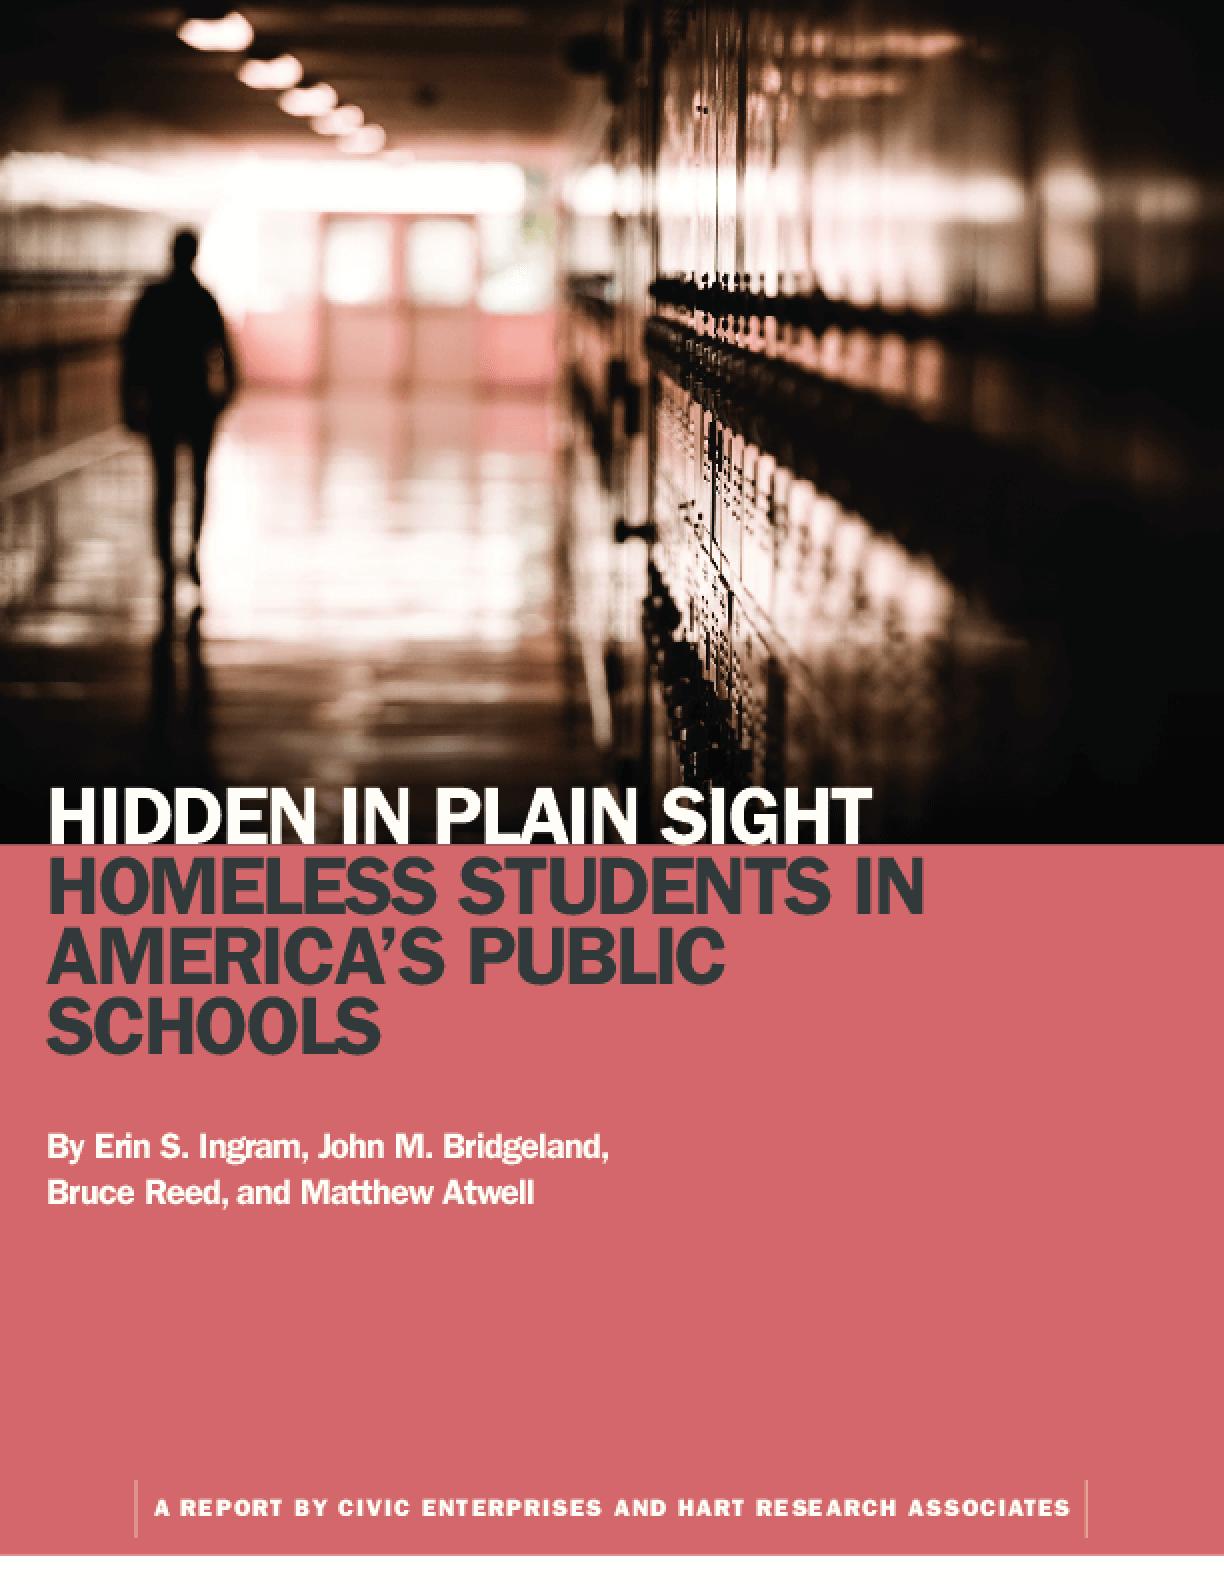 Hidden in Plain Sight: Homeless Students In America's Public Schools